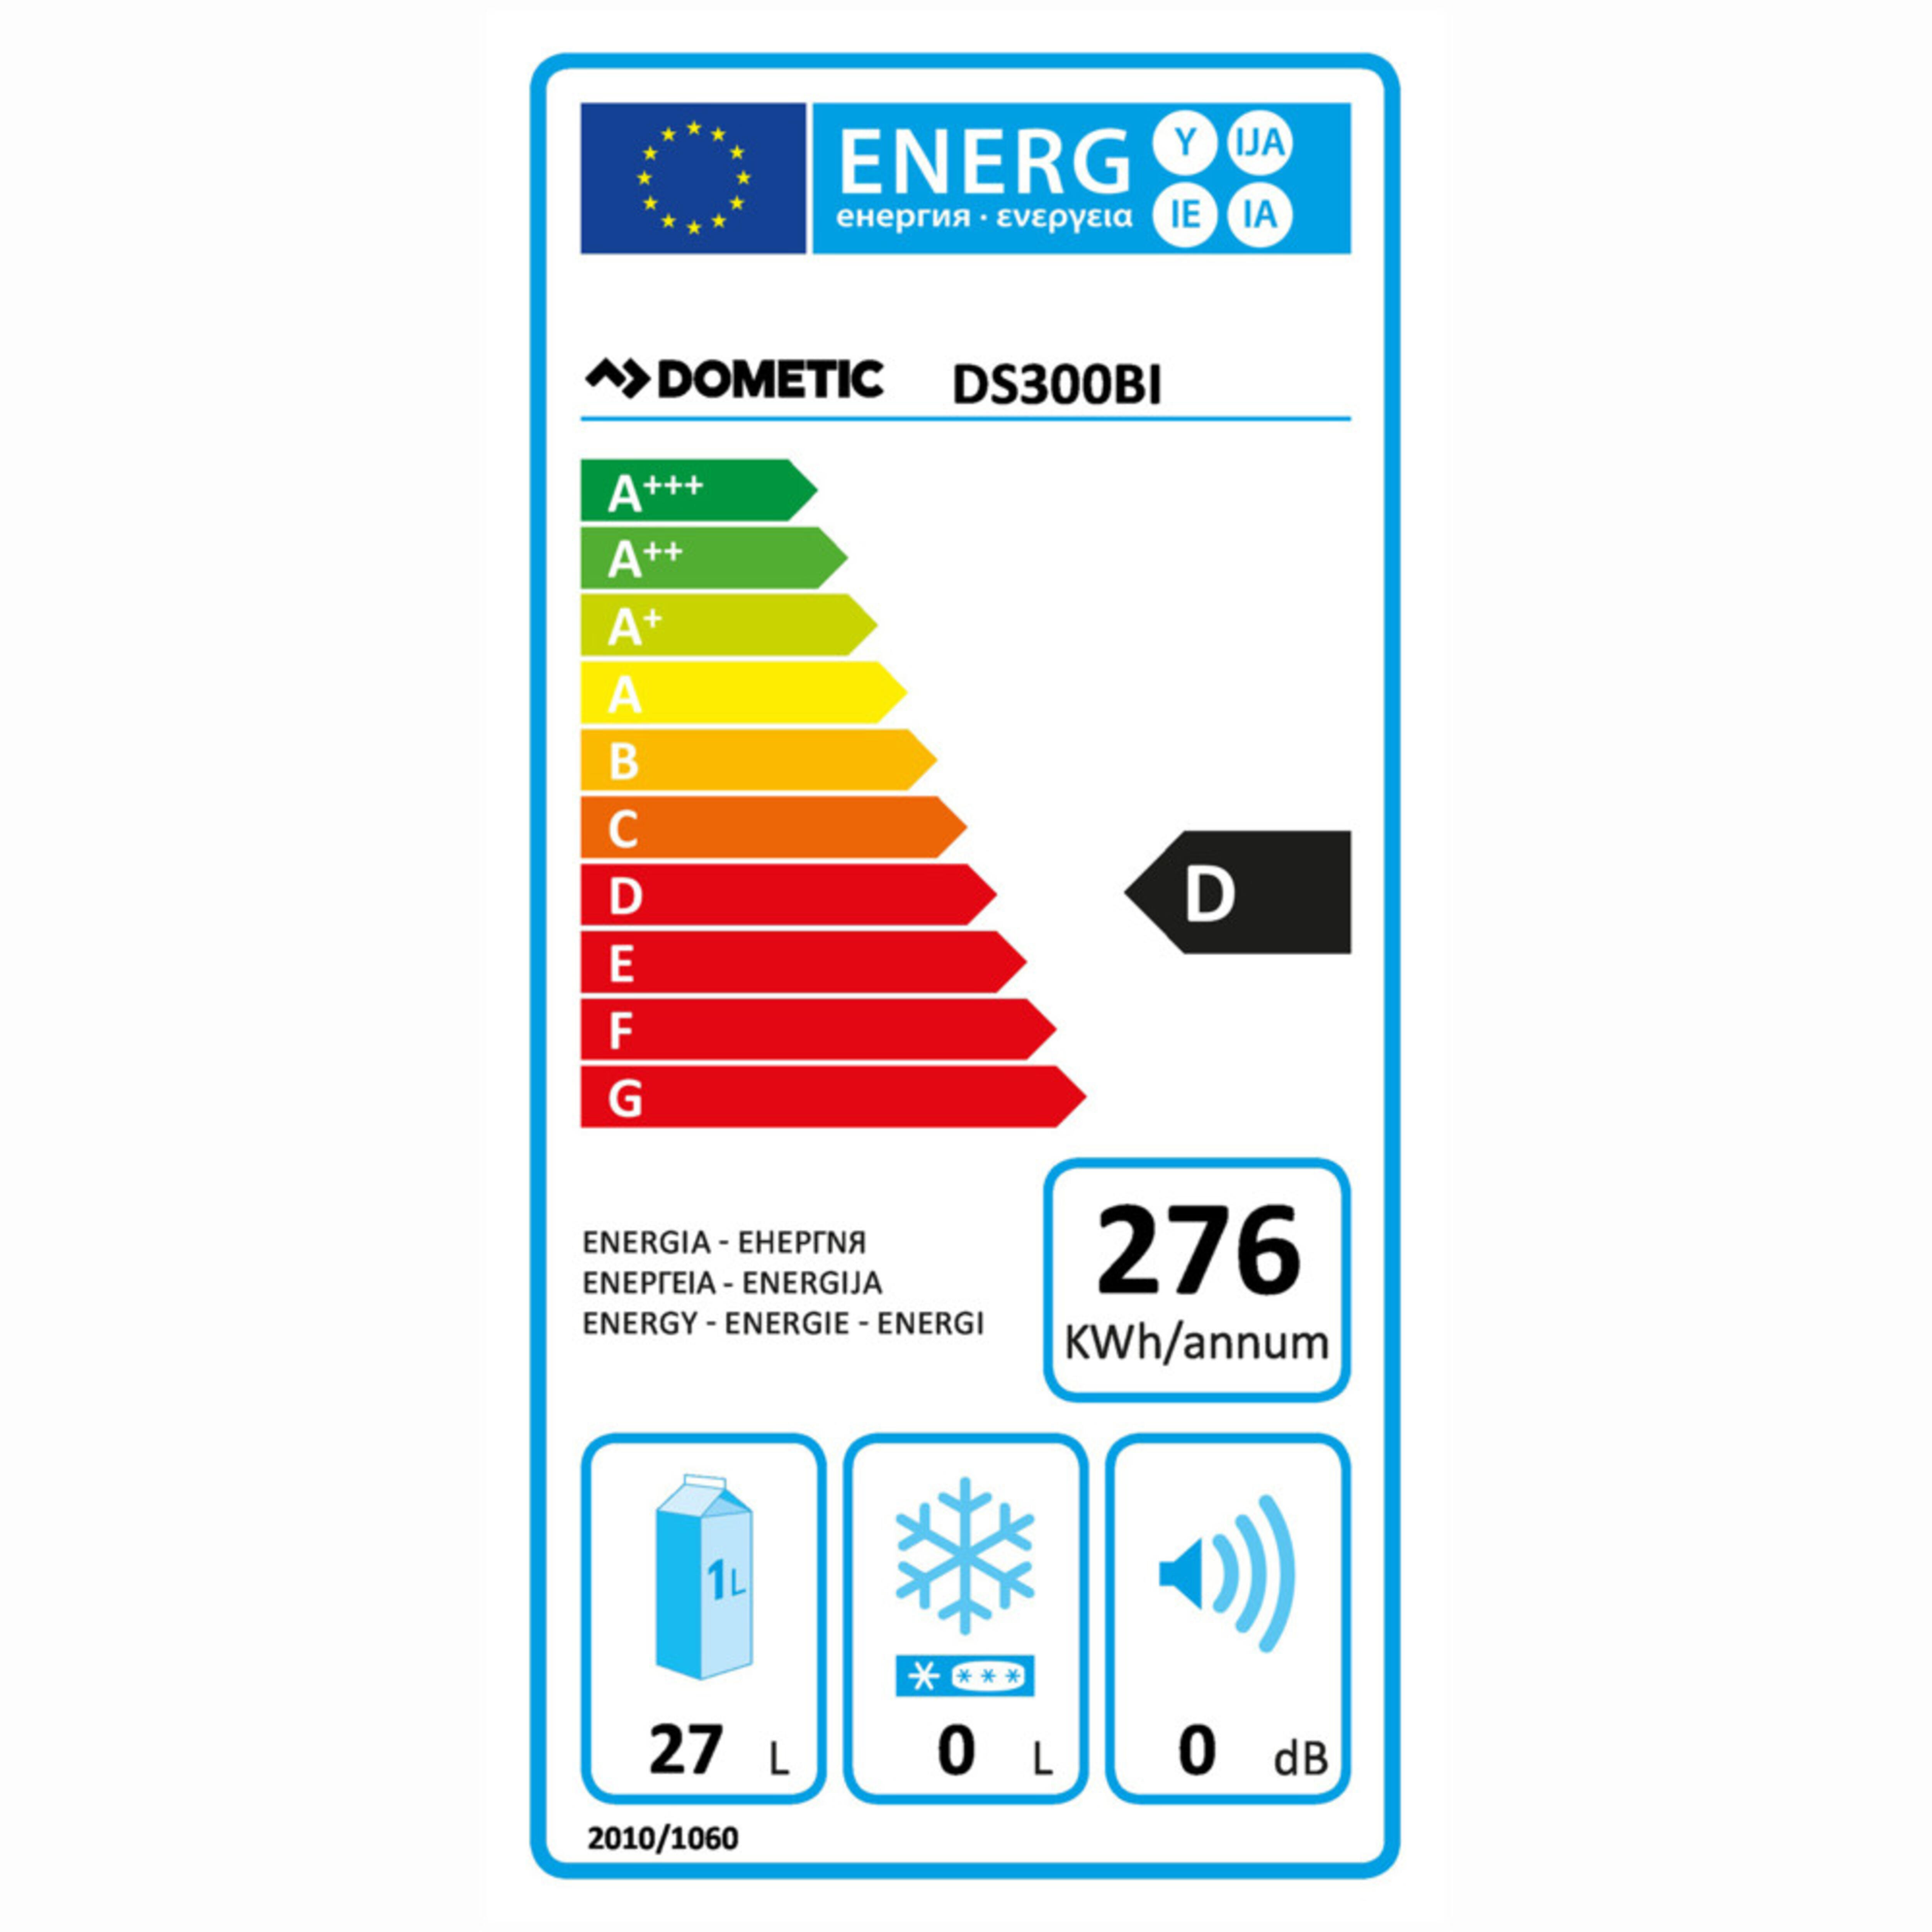 Dometic DS 300 BI Energy label